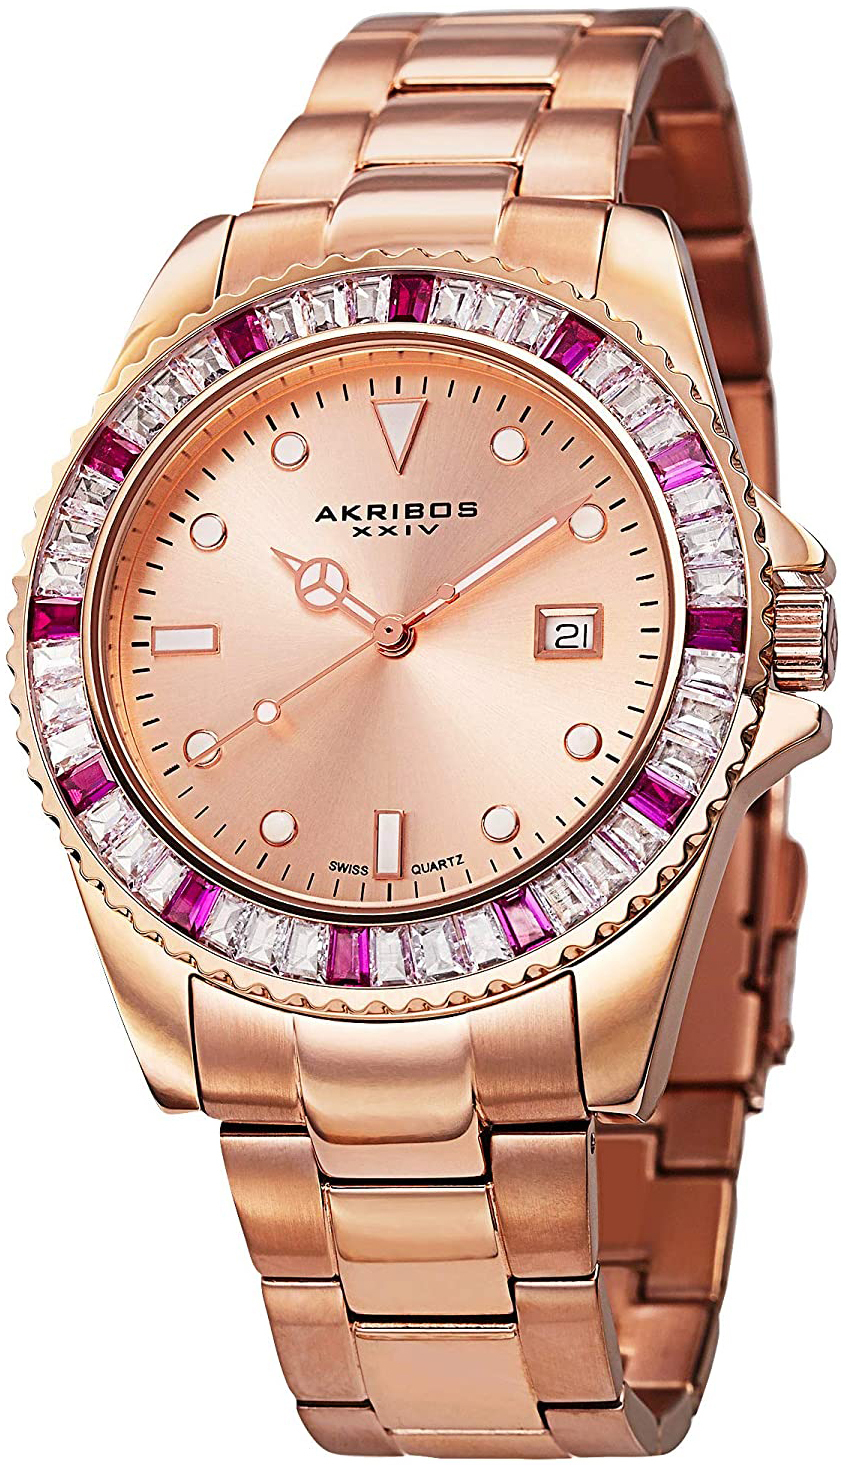 Akribos XXIV Crystal AK702RG Rosegullfarget/Rose-gulltonet stål Ø40 - Akribos XXIV